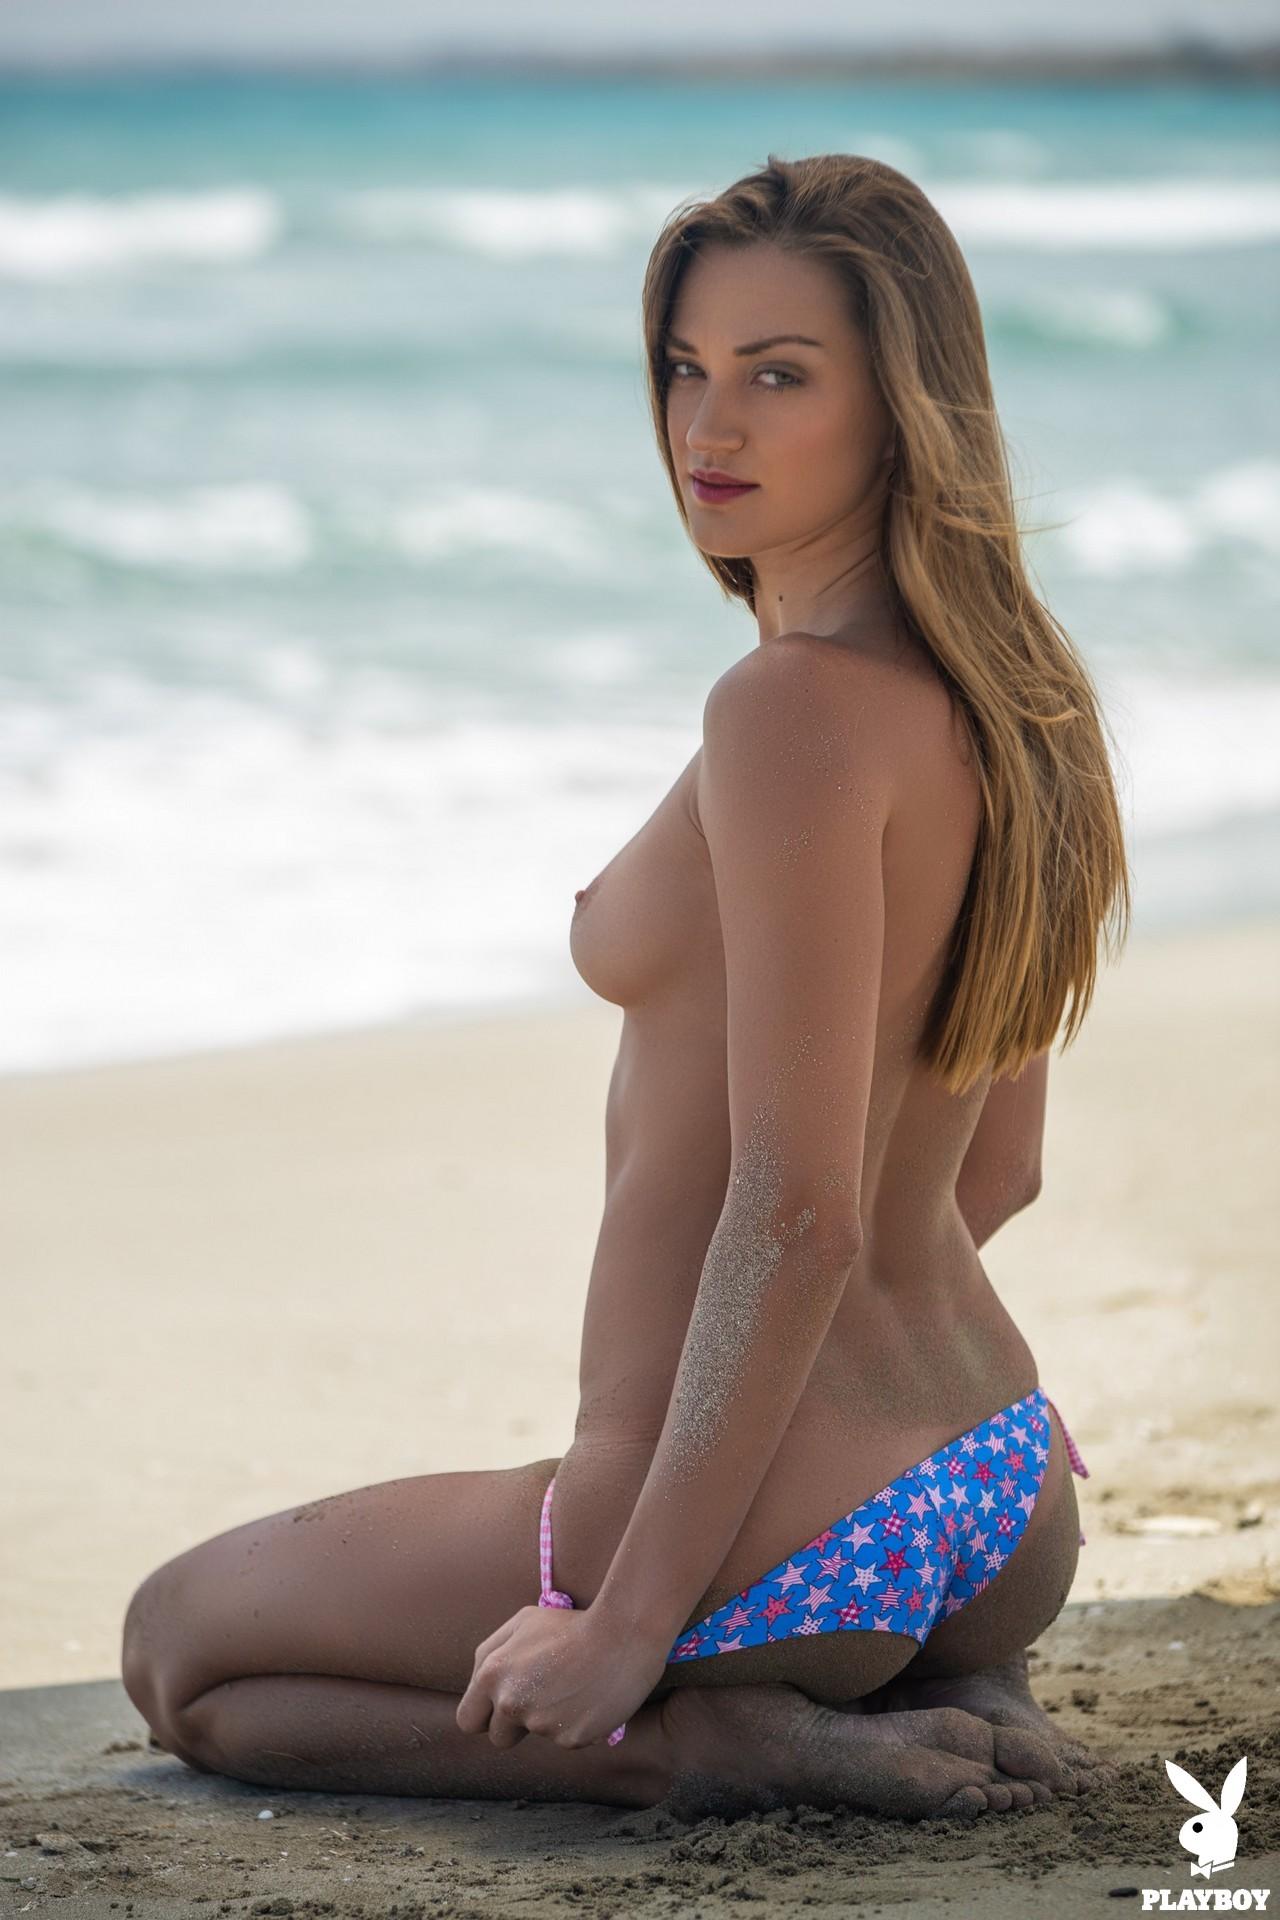 Nicole Fox in Sandy Shores - Playboy Plus 8